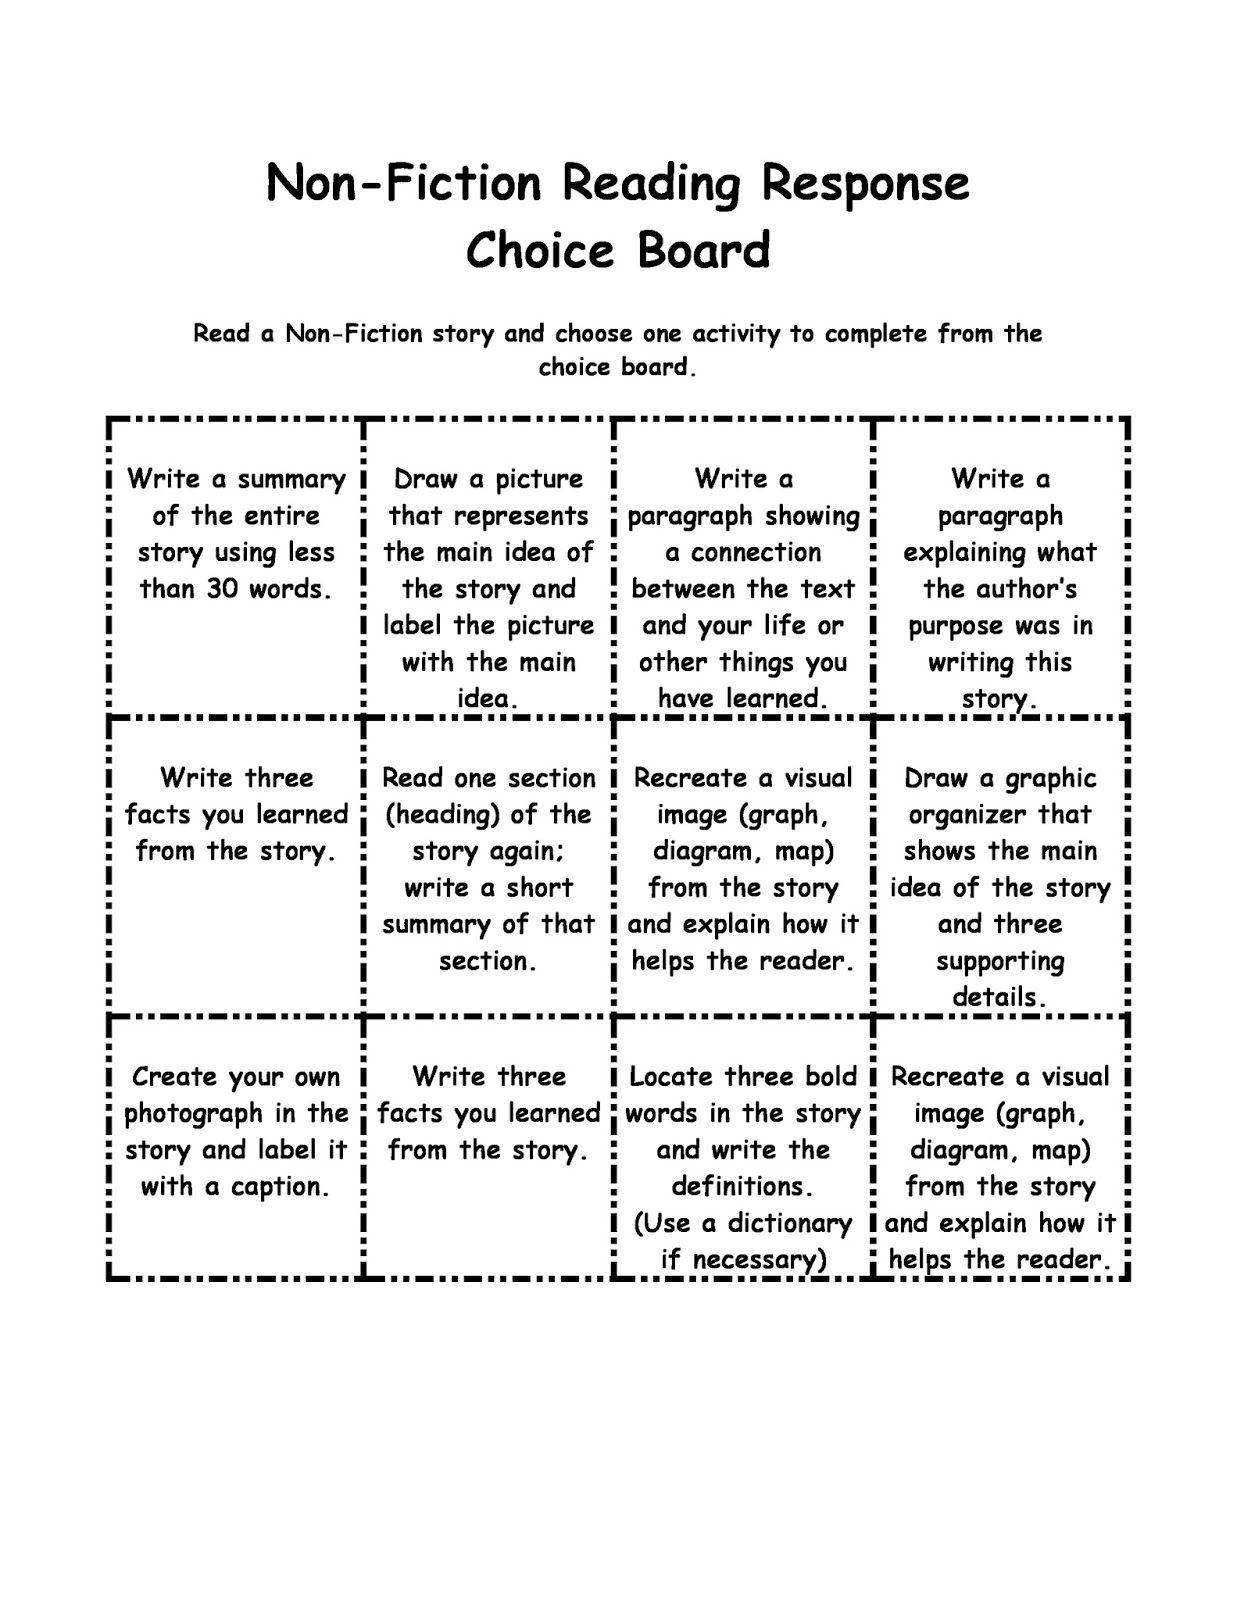 Non Fiction Choice Board